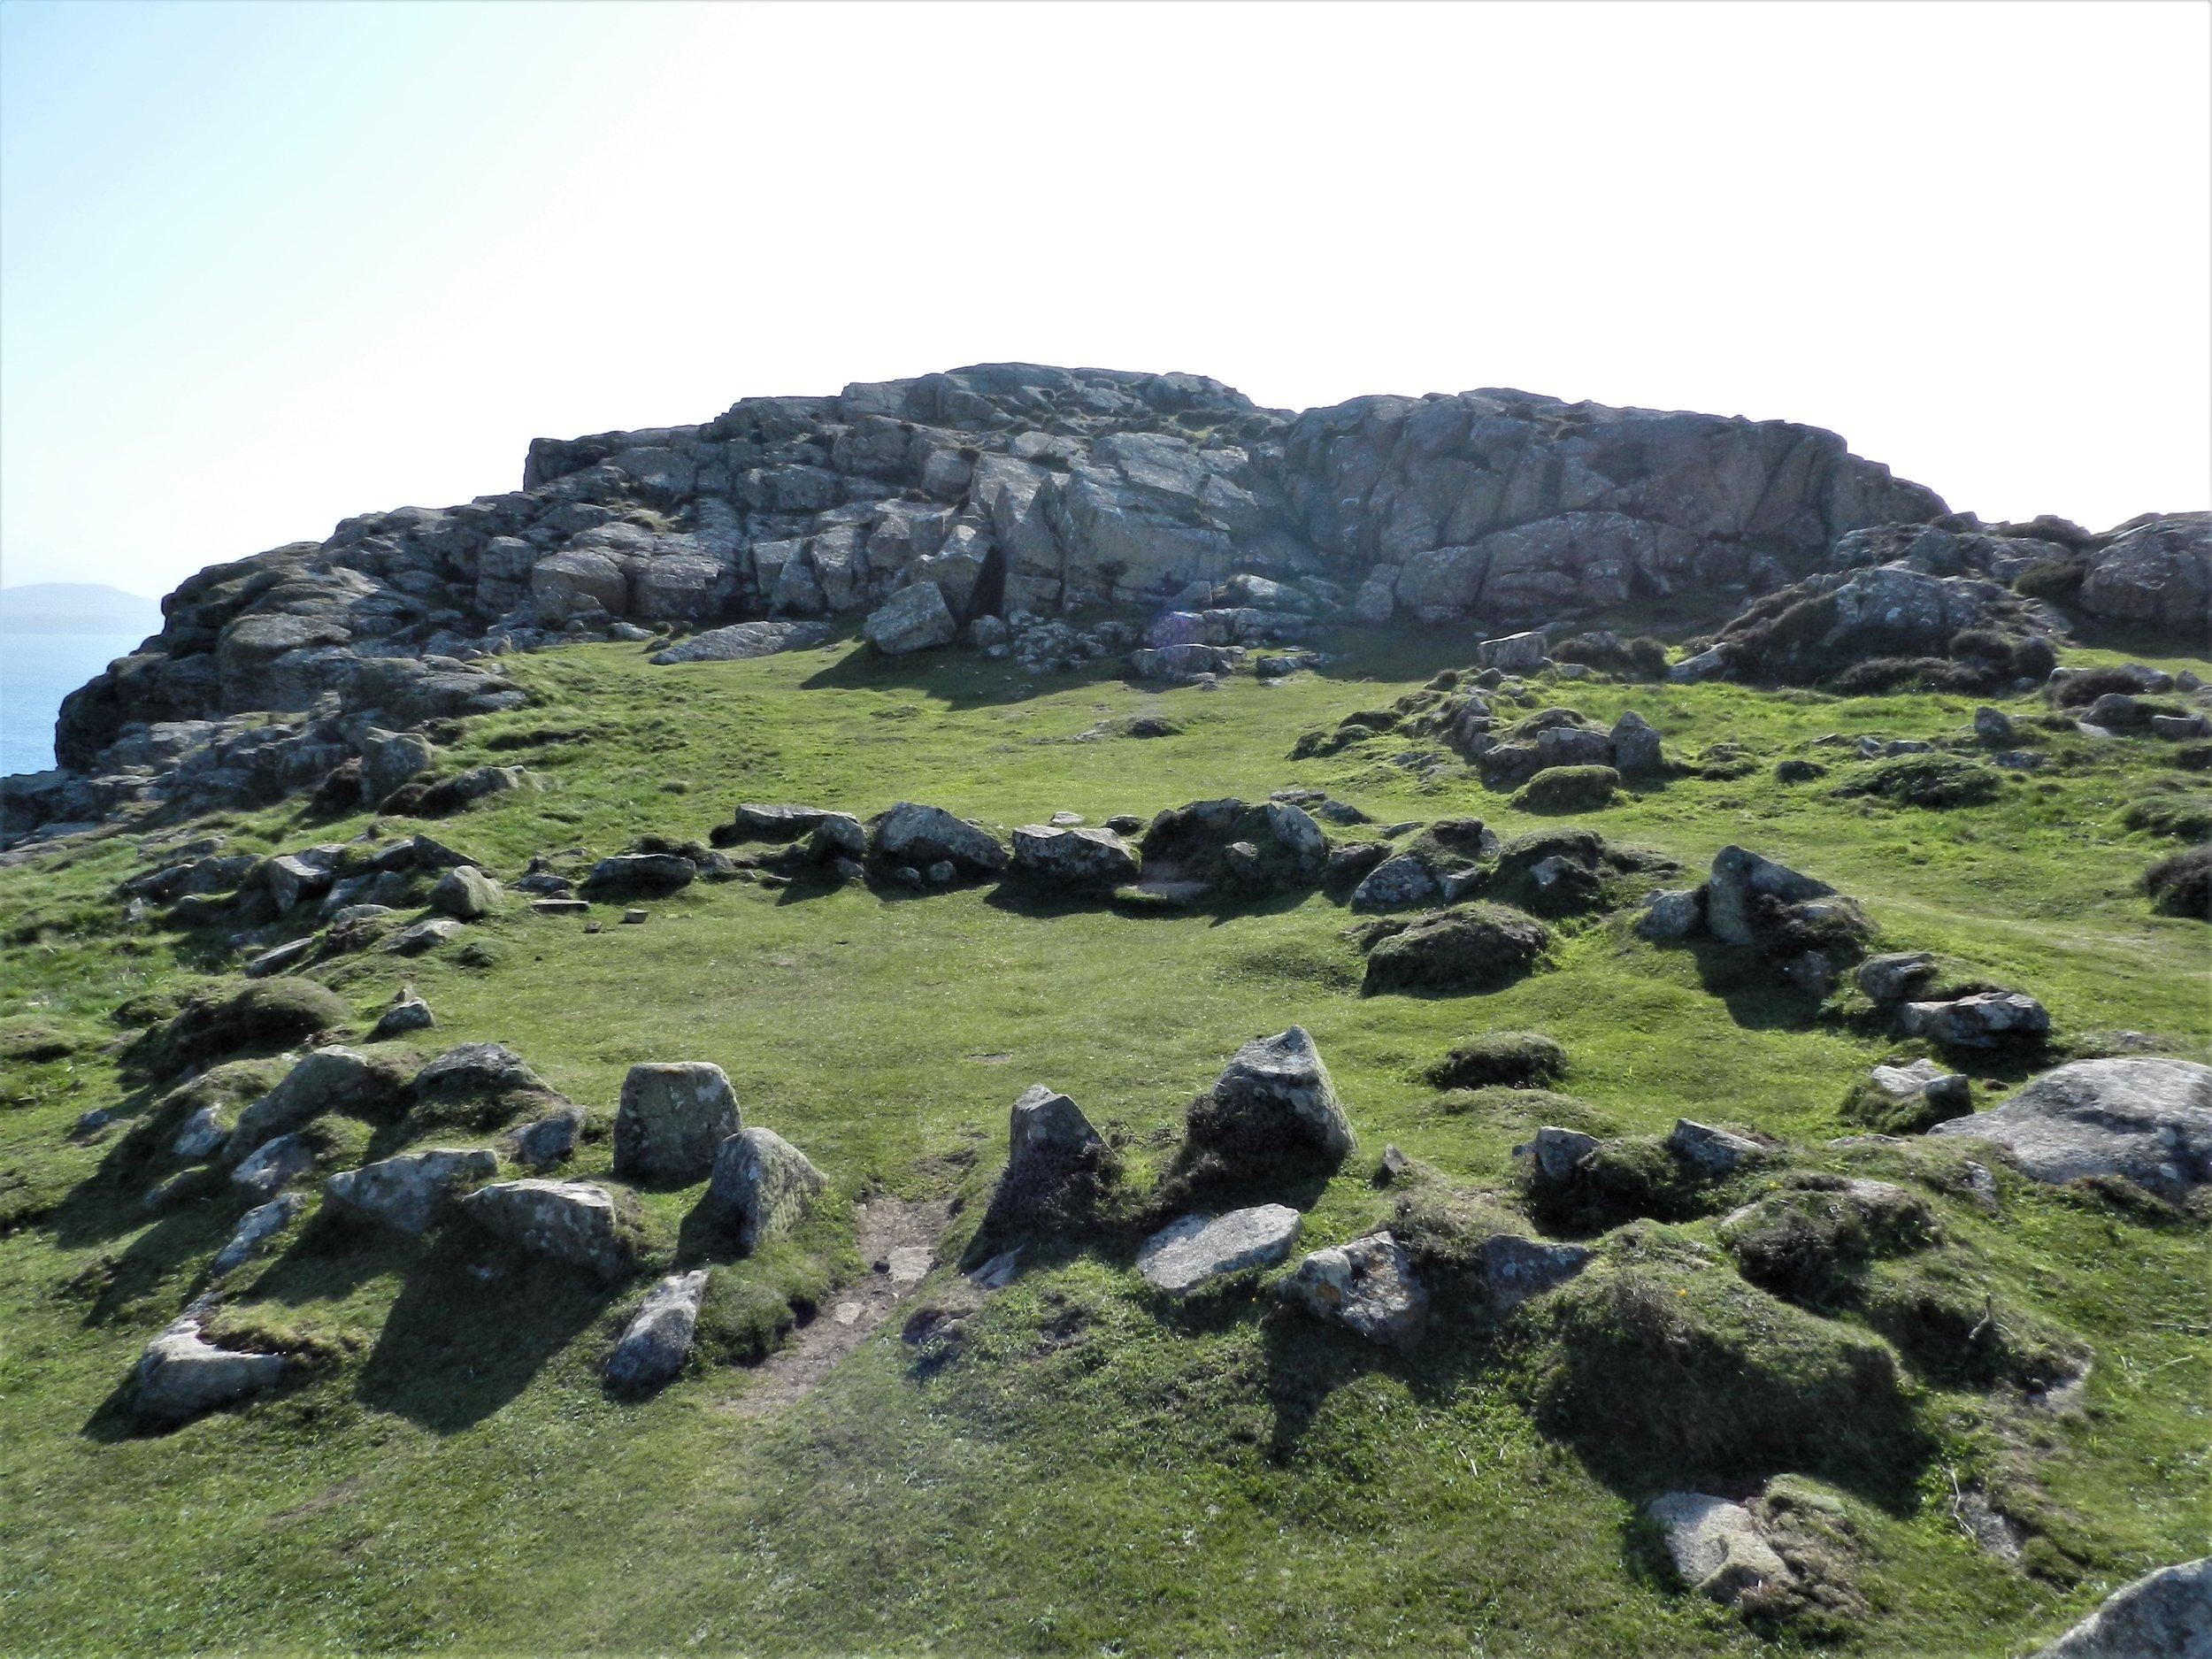 St. David's Head, Wales | Stone Circles